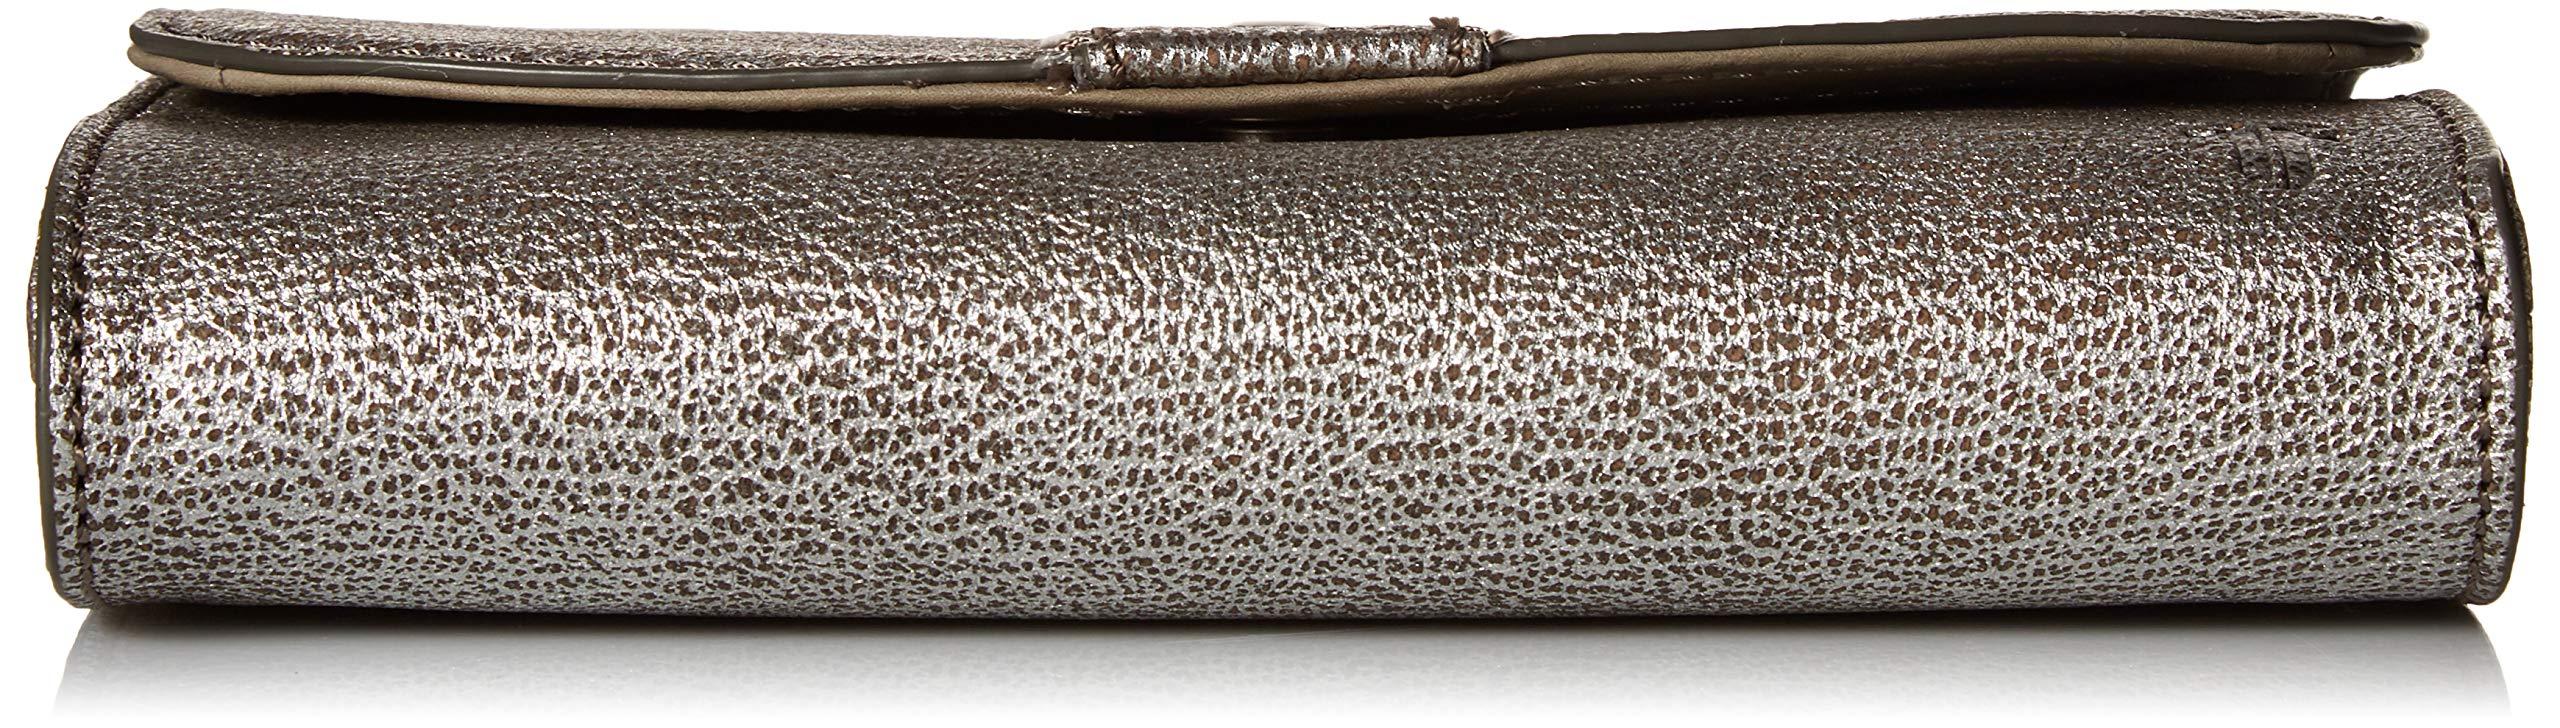 FRYE Melissa Wallet Crossbody Clutch Leather Bag, silver by FRYE (Image #4)